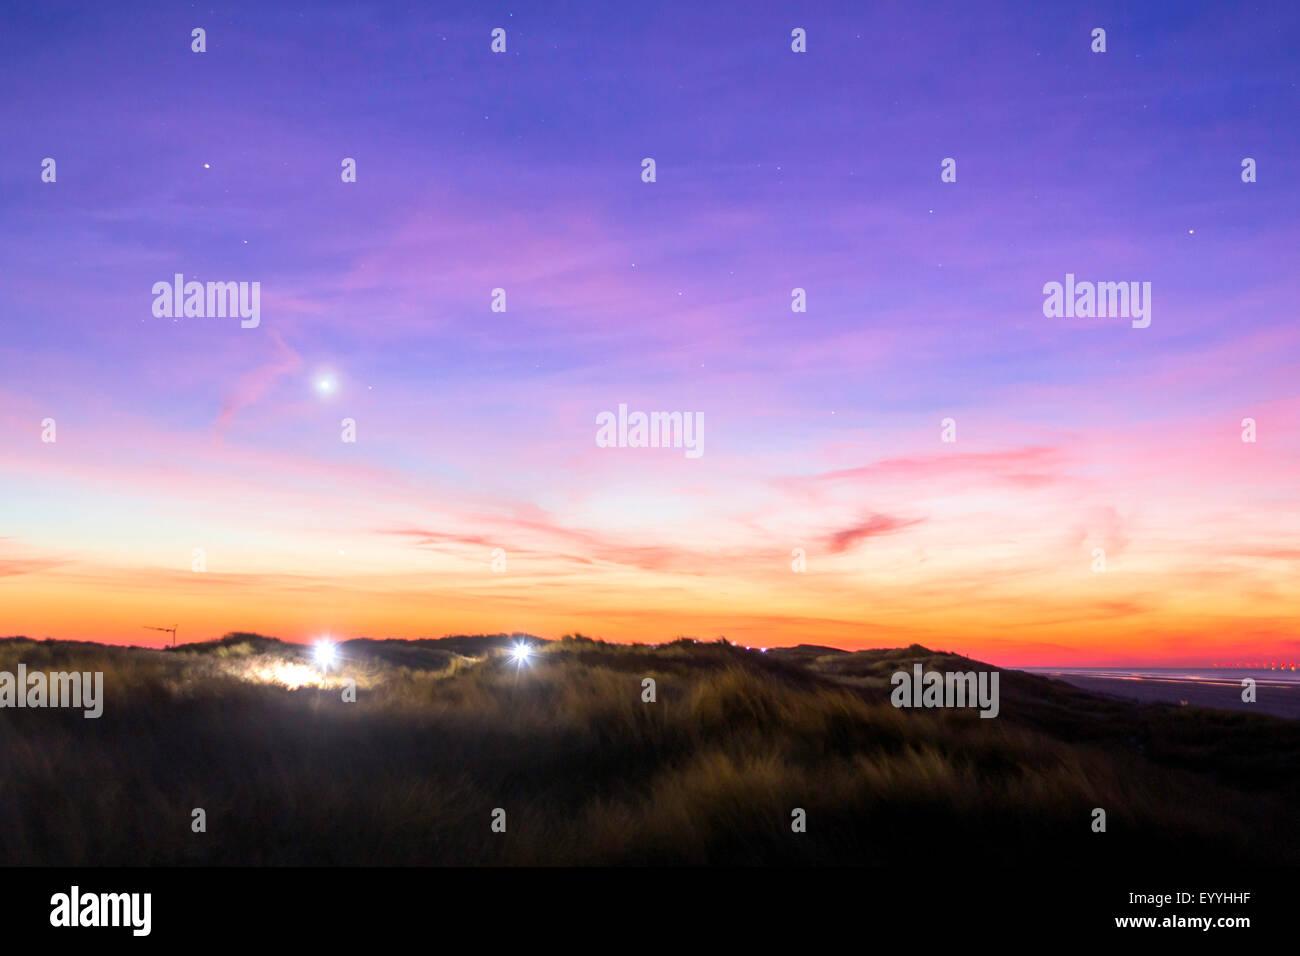 planet Venus over island Juist, Germany, Lower Saxony, Juist - Stock Image